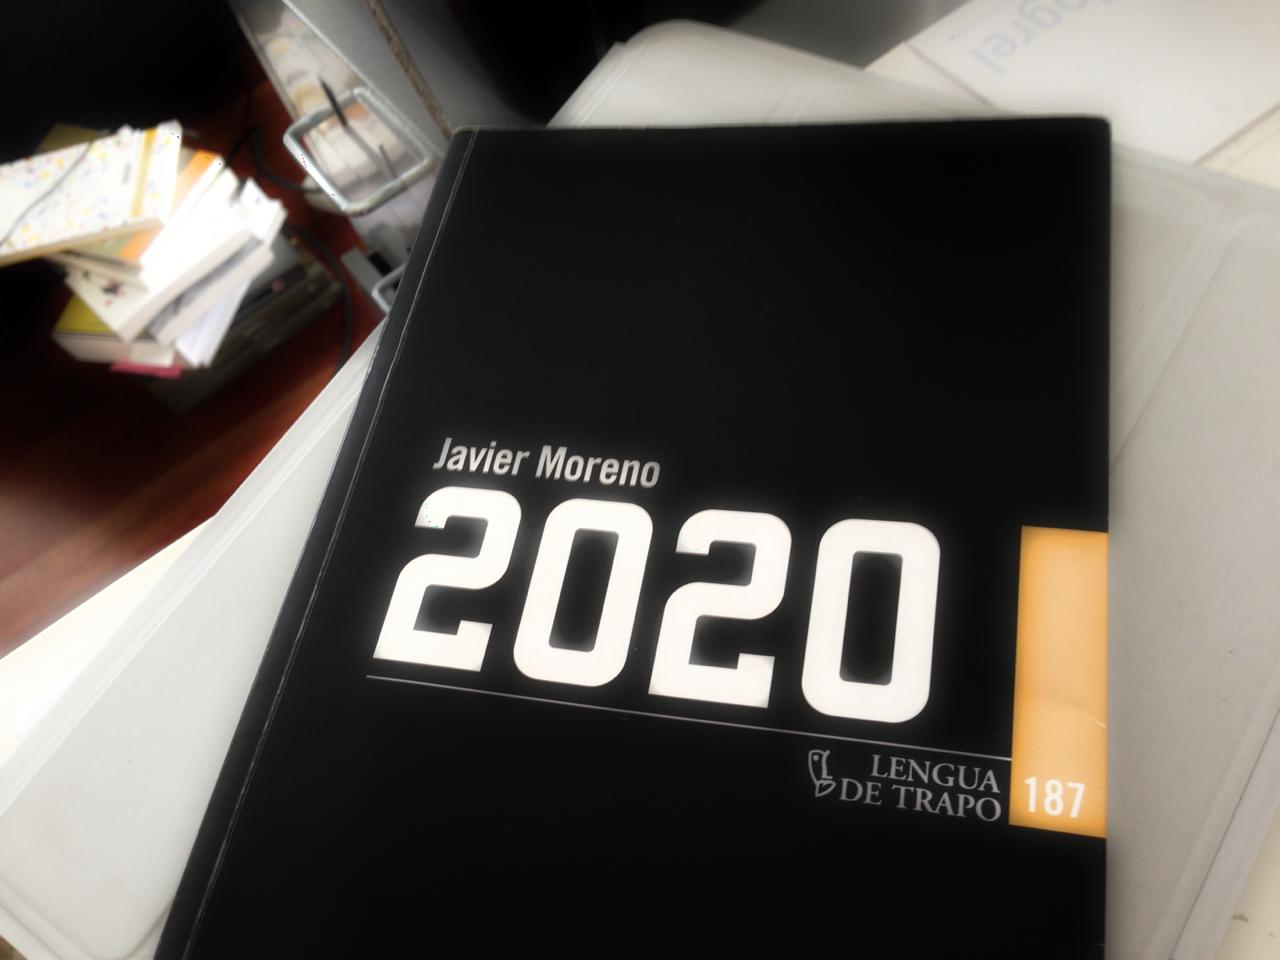 2020 Javier Moreno